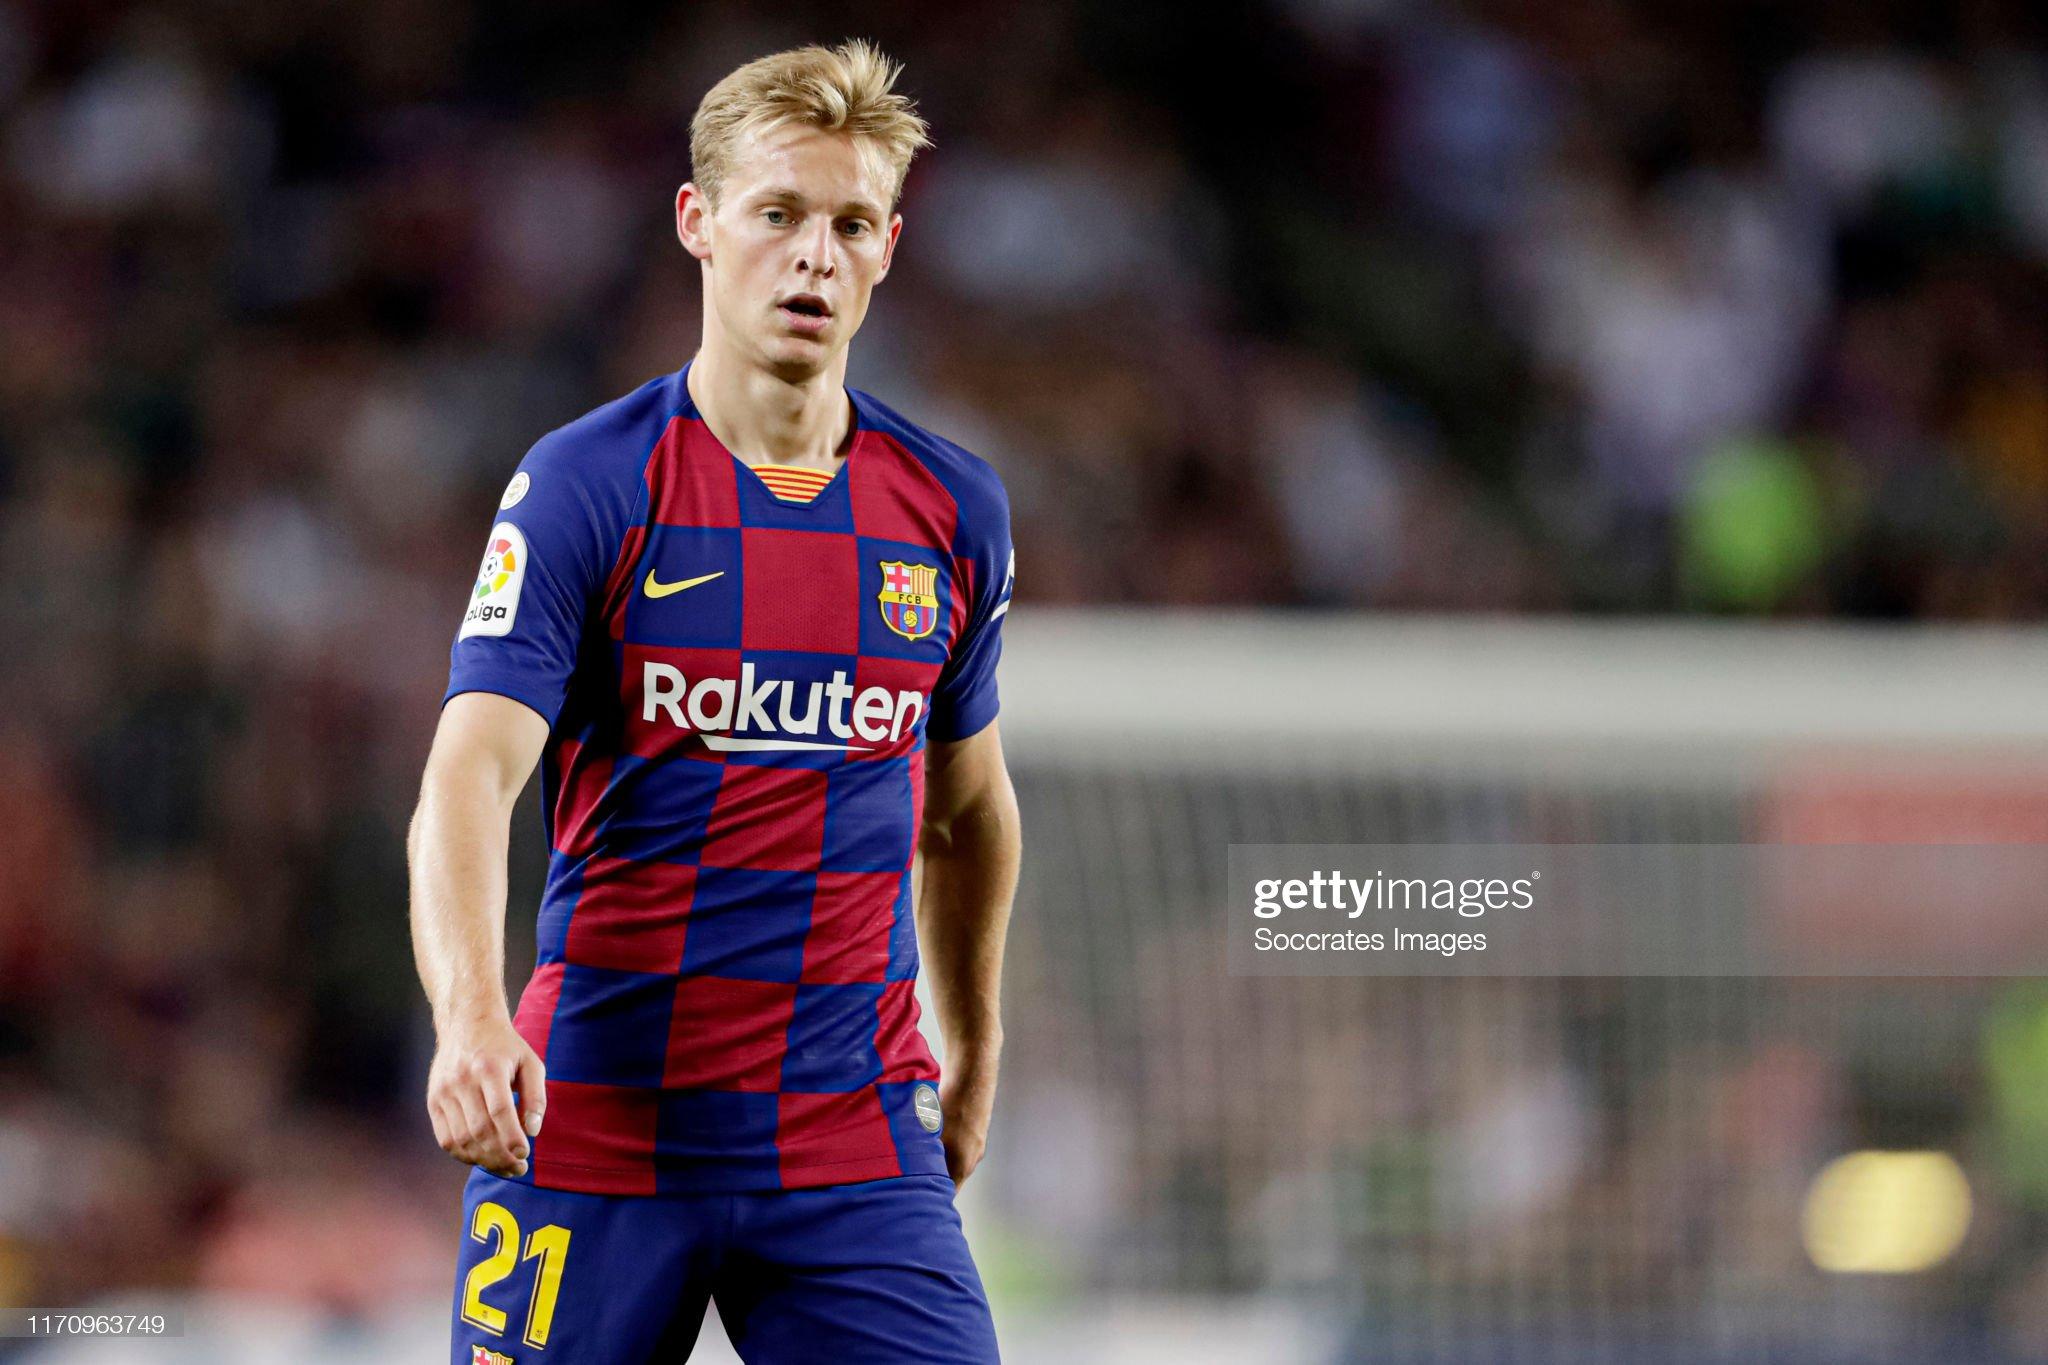 صور مباراة : برشلونة - فياريال 2-1 ( 24-09-2019 )  Frenkie-de-jong-of-fc-barcelona-during-the-la-liga-santander-match-picture-id1170963749?s=2048x2048